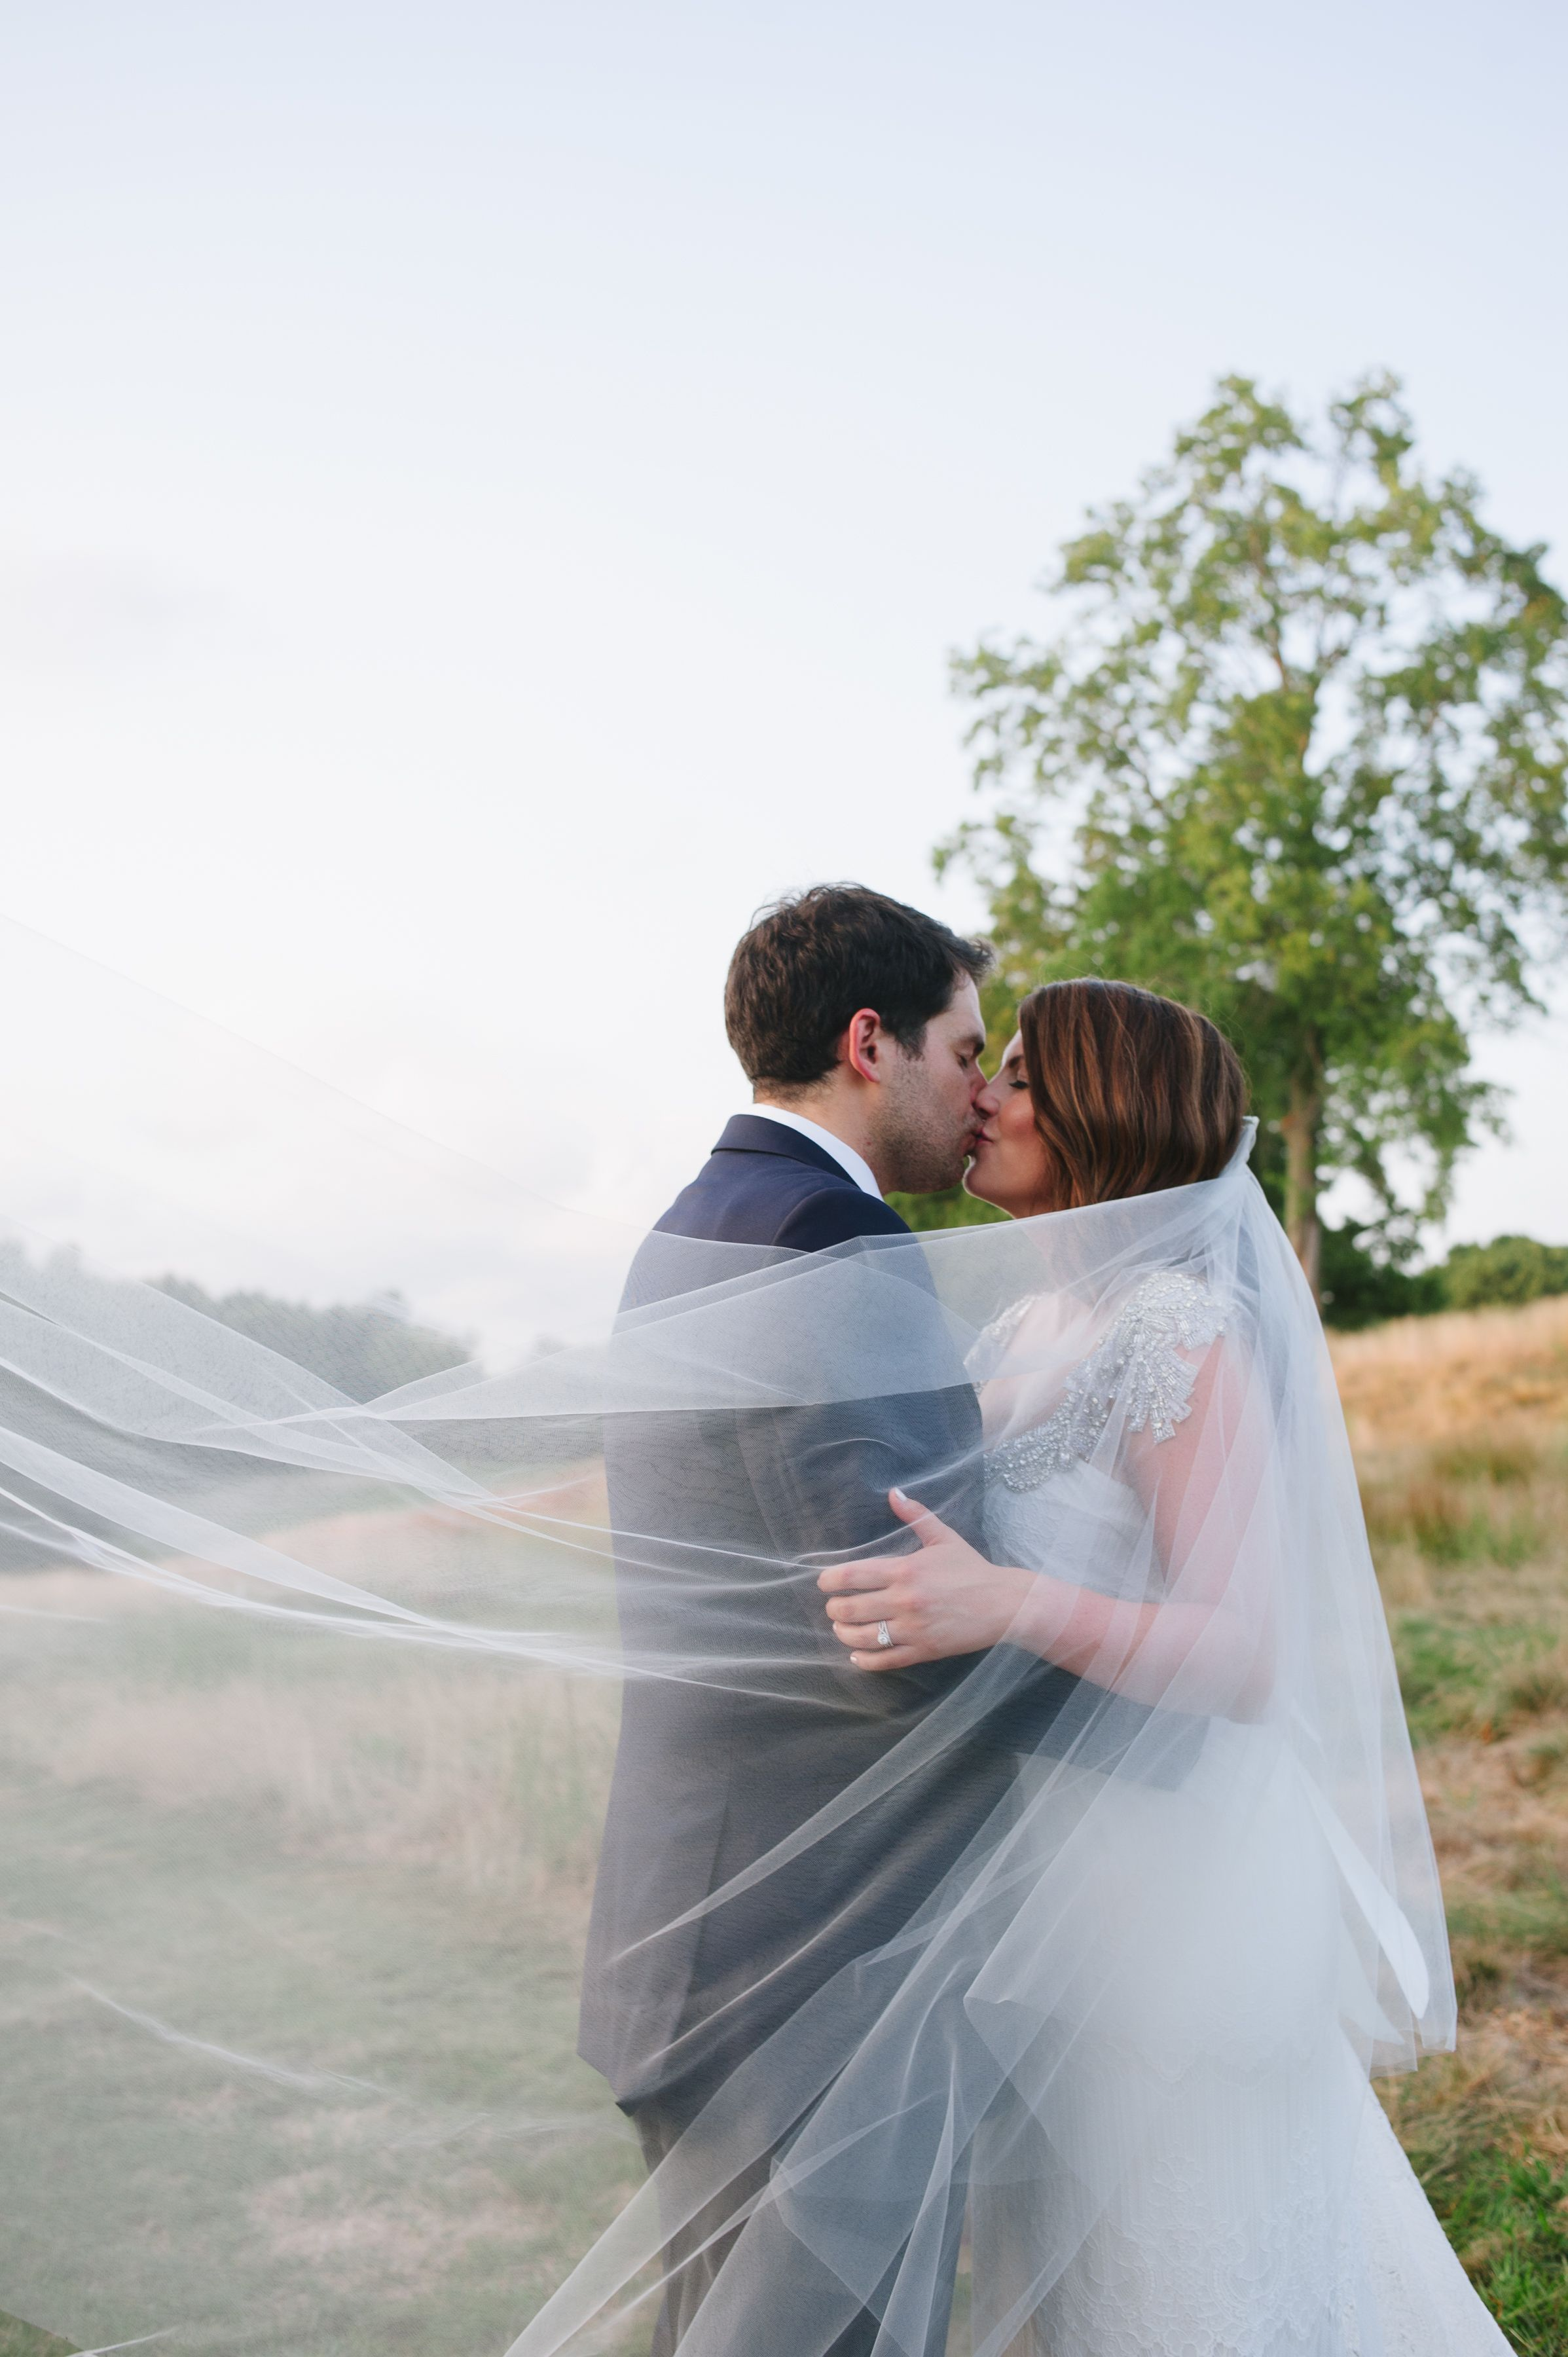 Outdoor Wedding Bride And Groom Long Bridal Veil Cathedral Length Veil Veil Veil Wedding Pictures Wedding Photography Bride Wedding Photography Styles